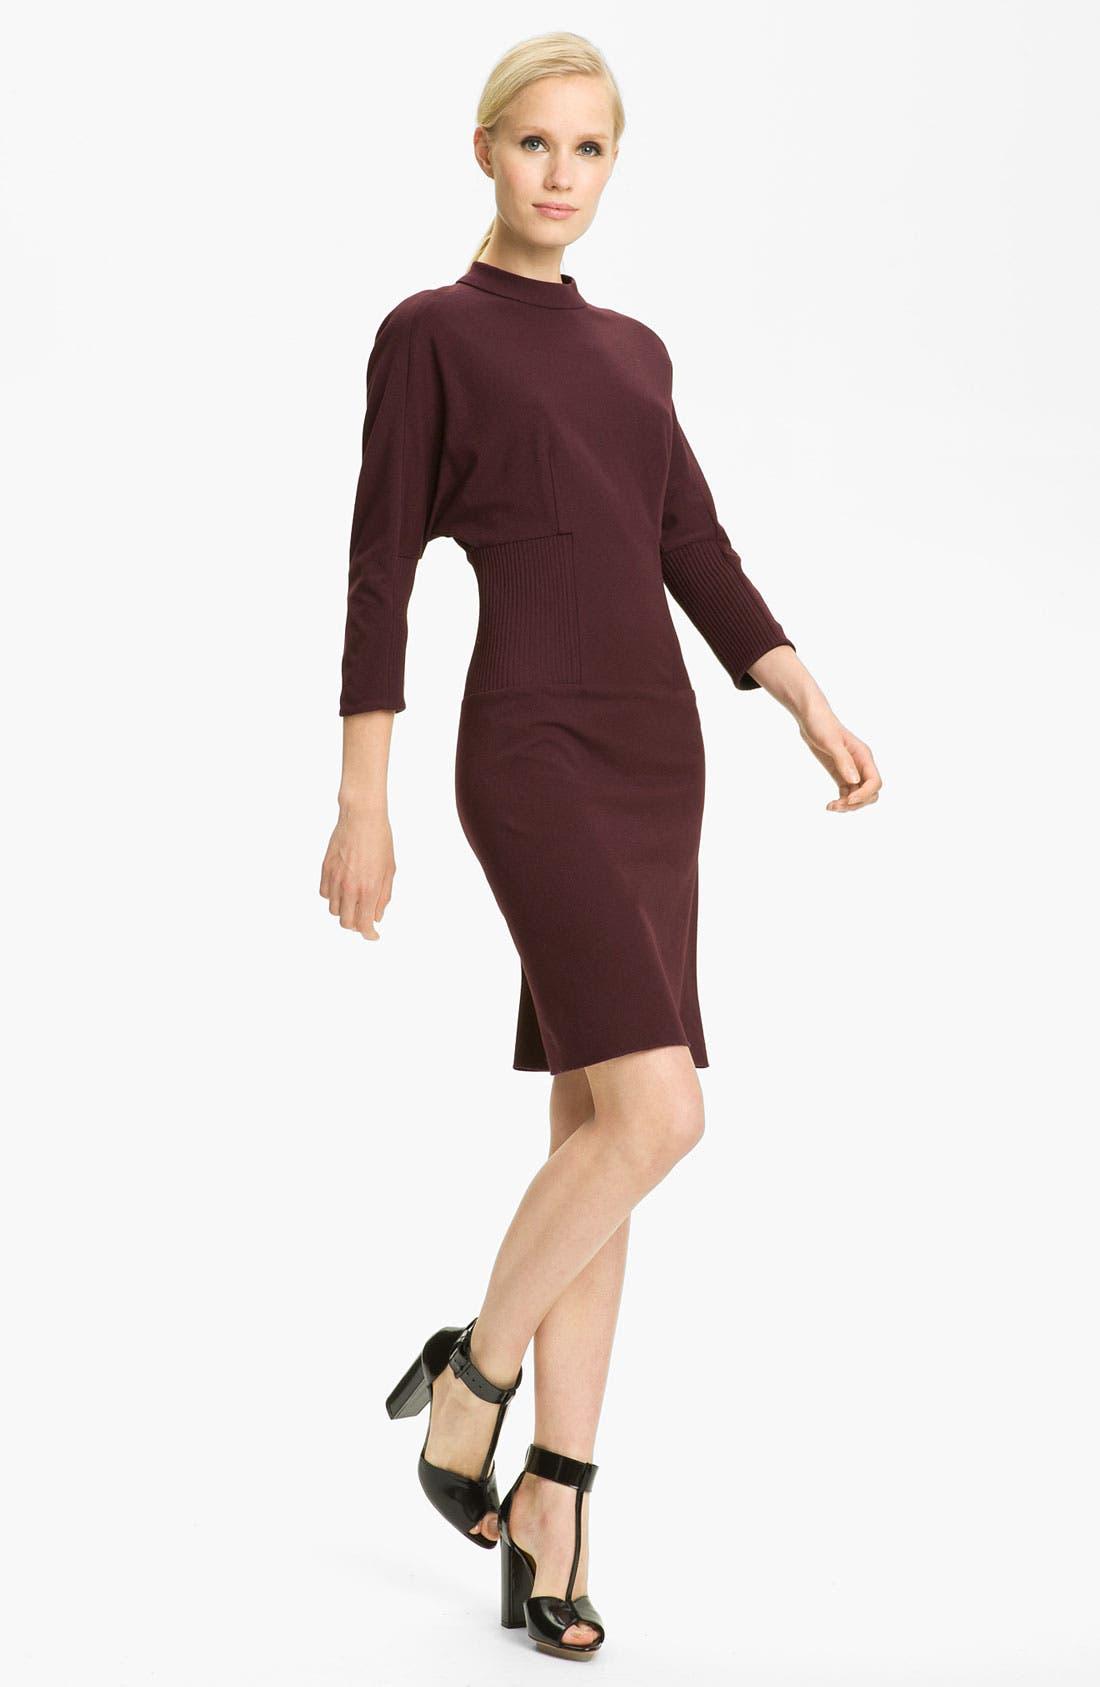 Main Image - 3.1 Phillip Lim Funnel Neck Dress